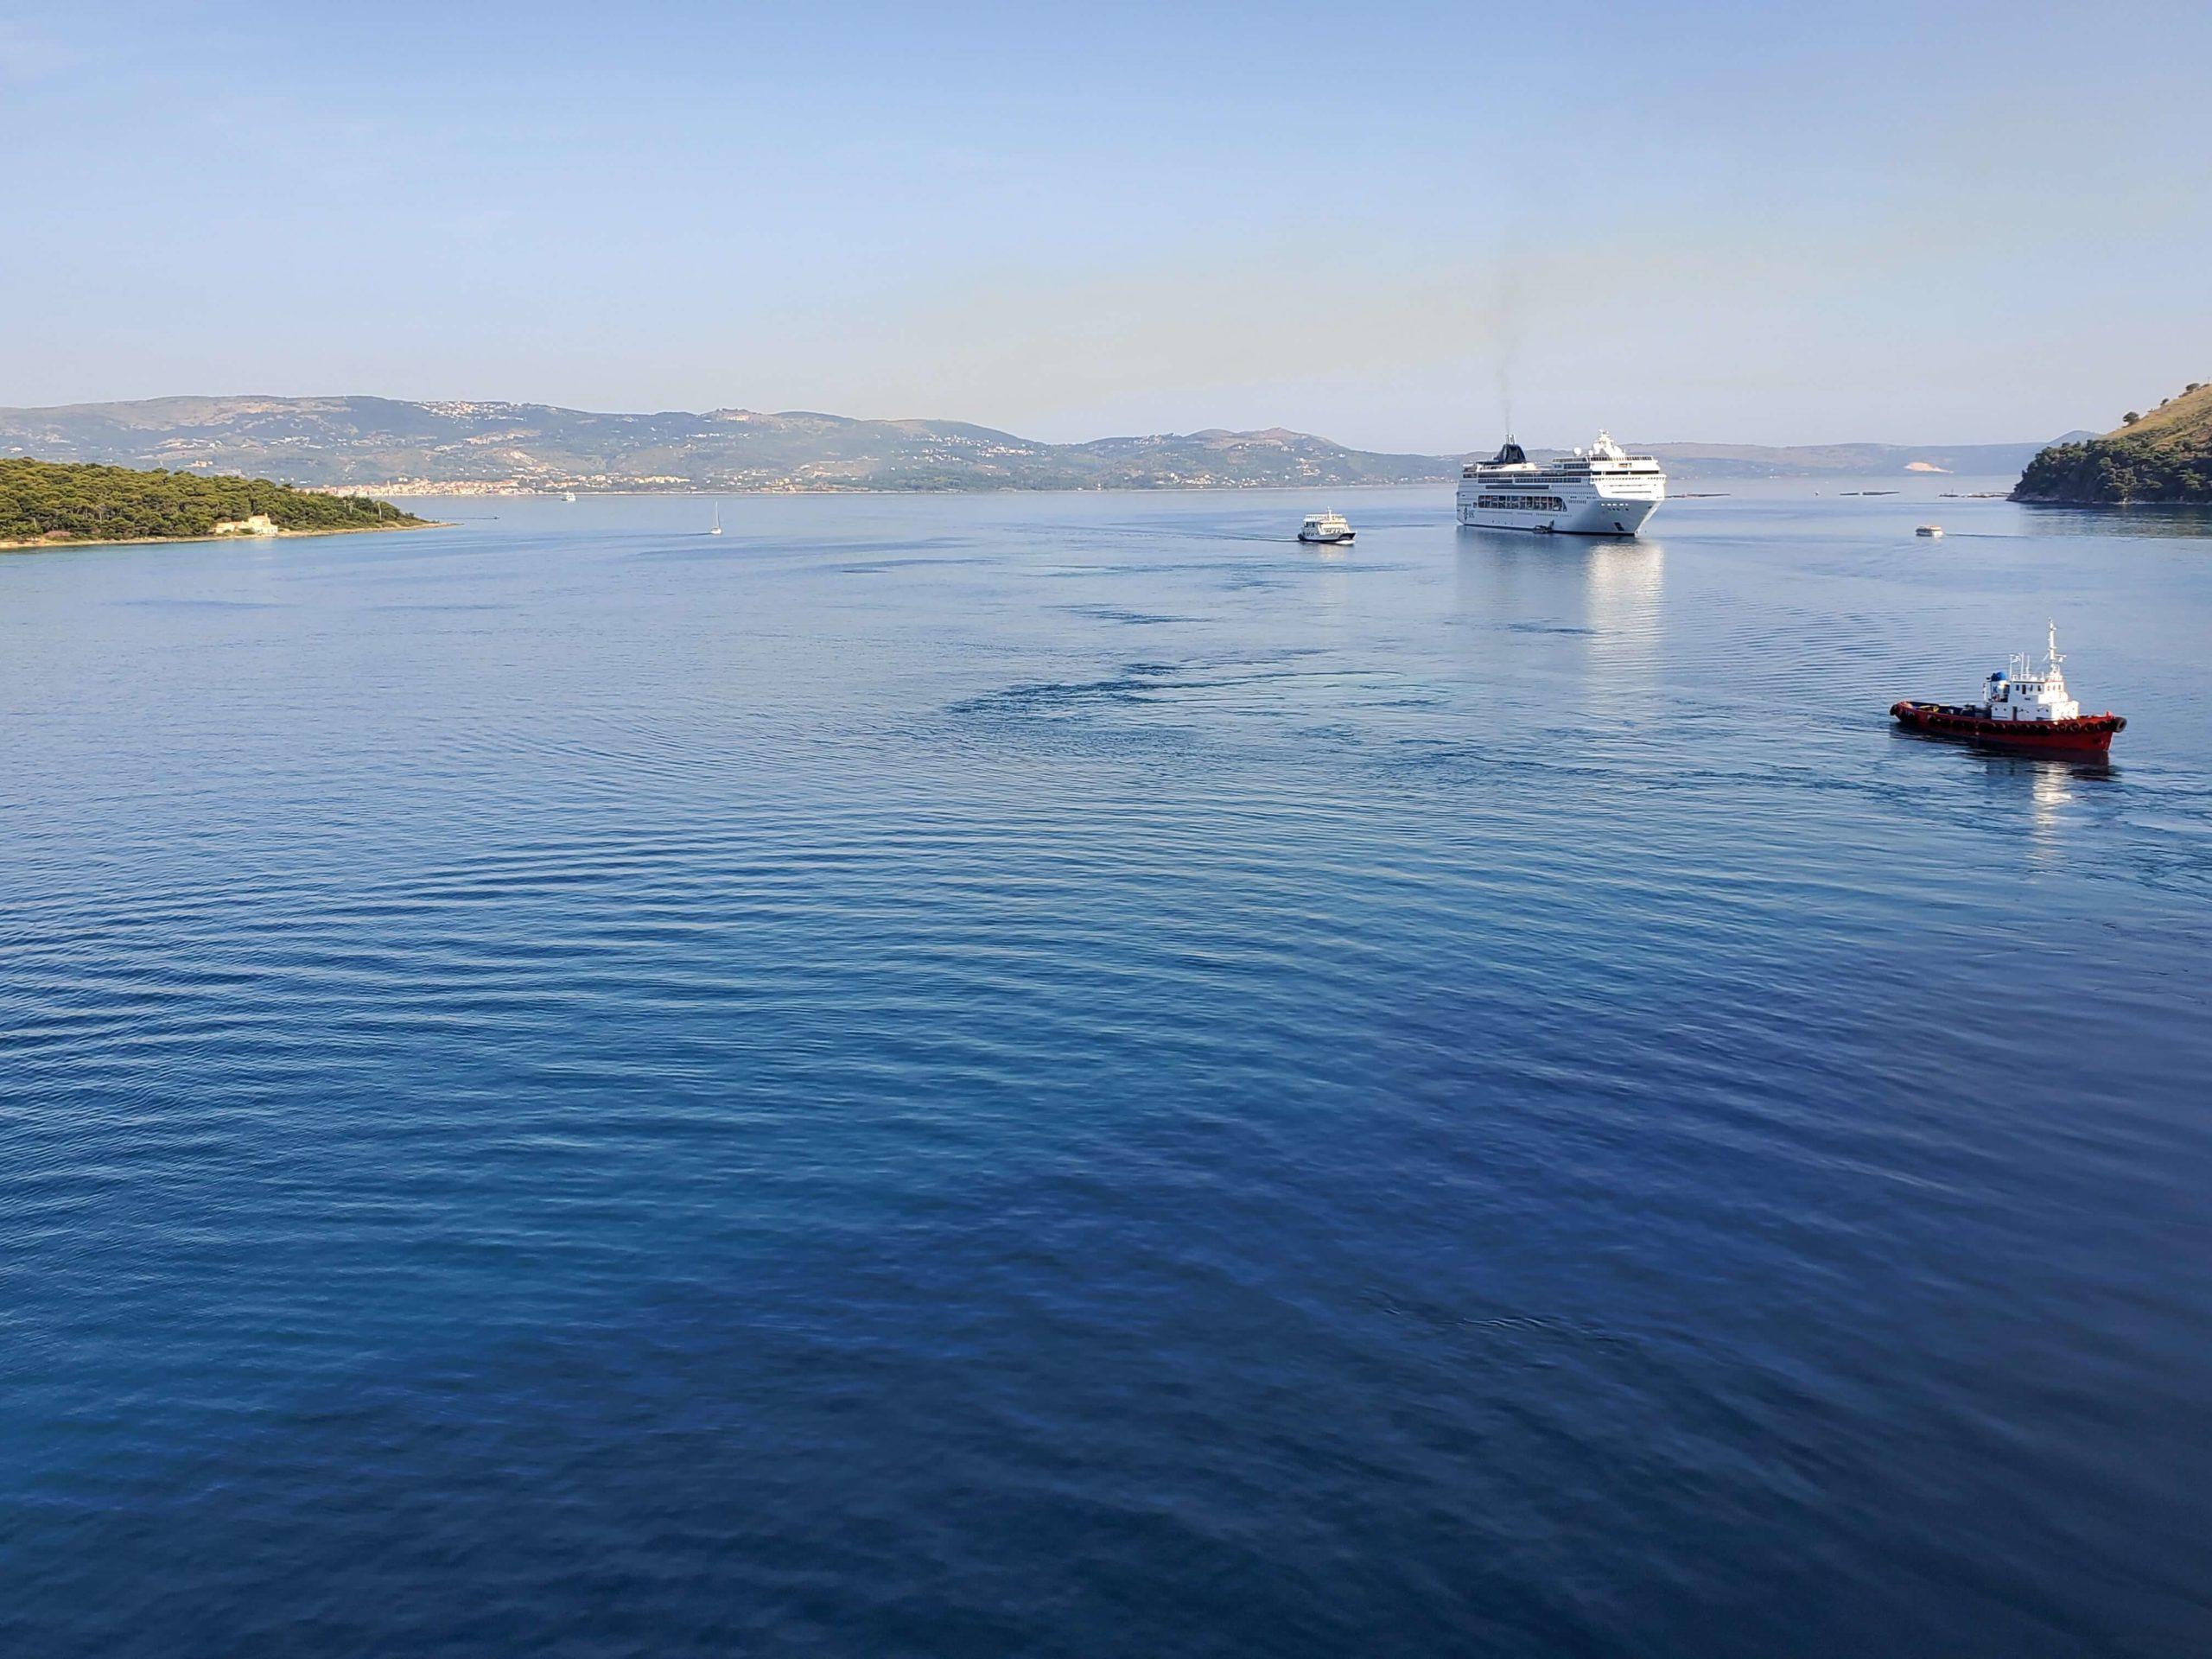 Cernys' Journeys: Norwegian Cruise Line